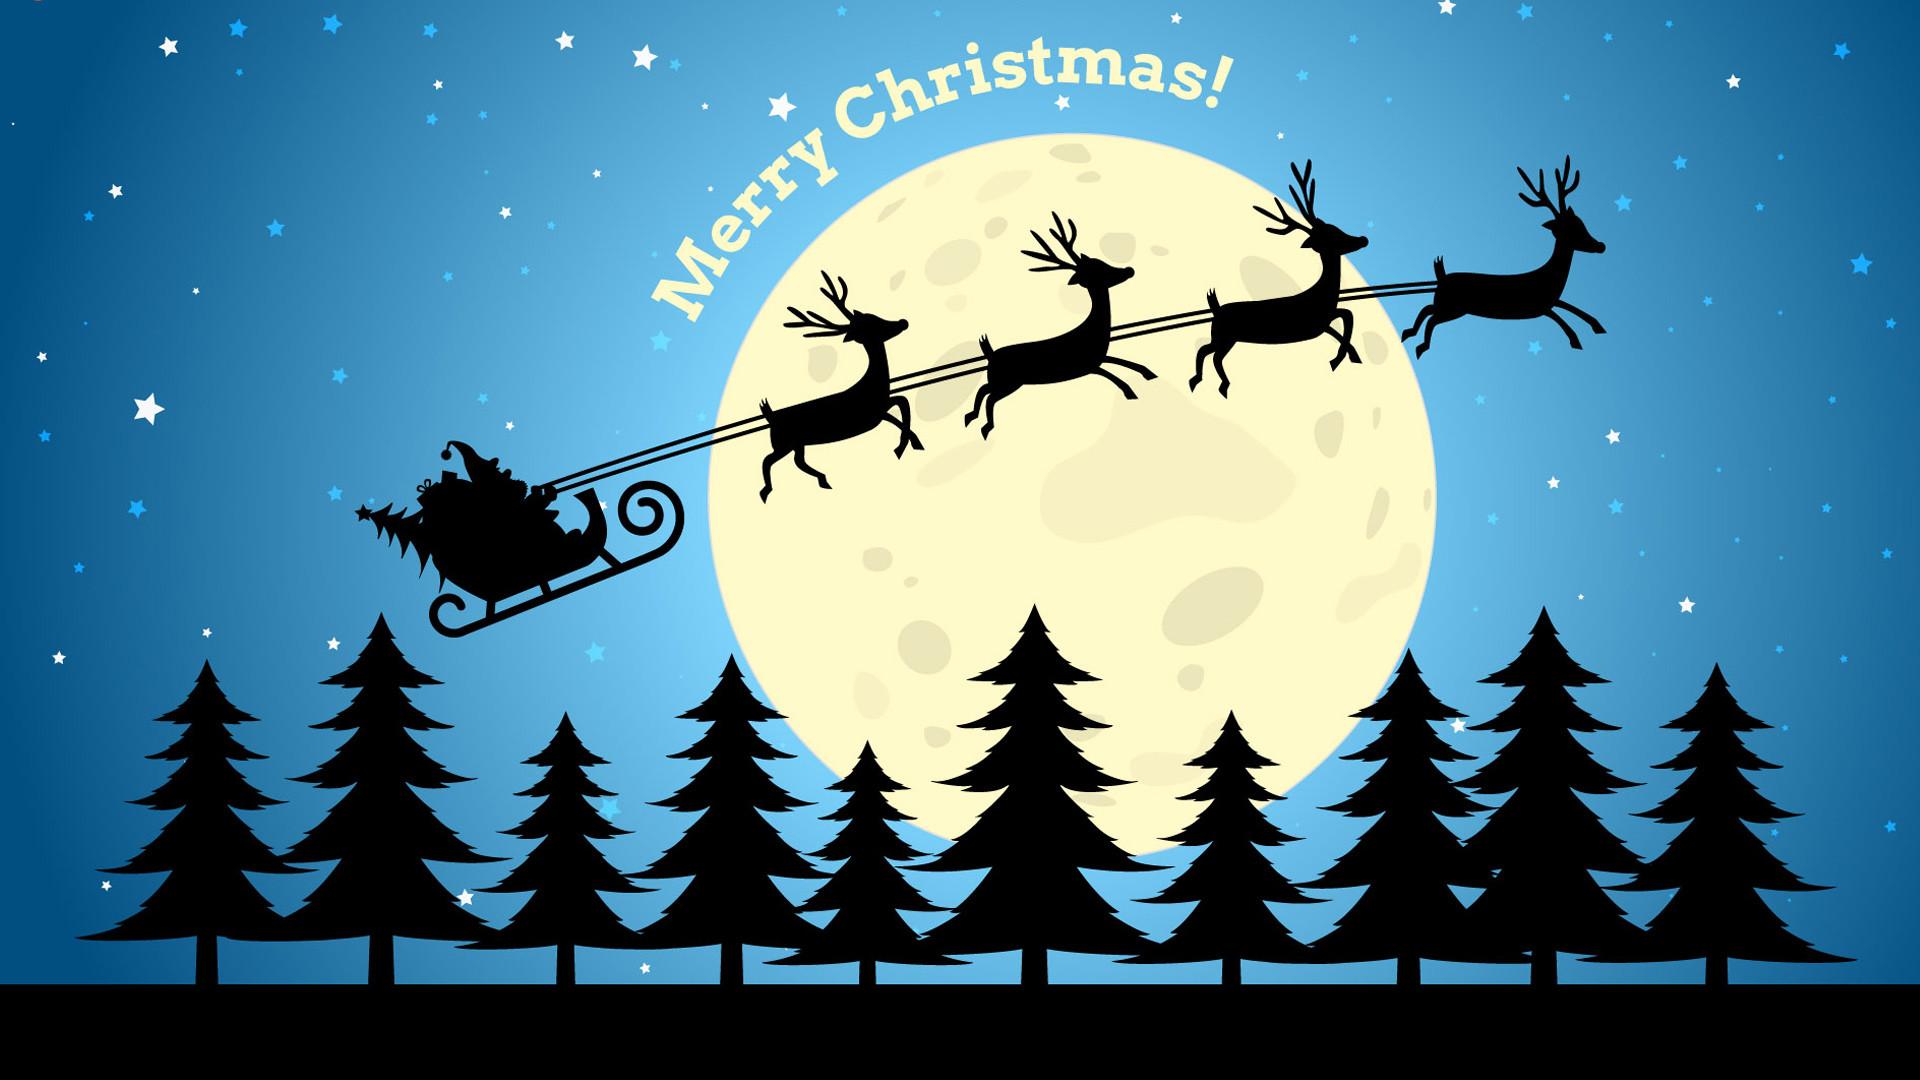 Merry christmas tree wallpaper 2015 HD